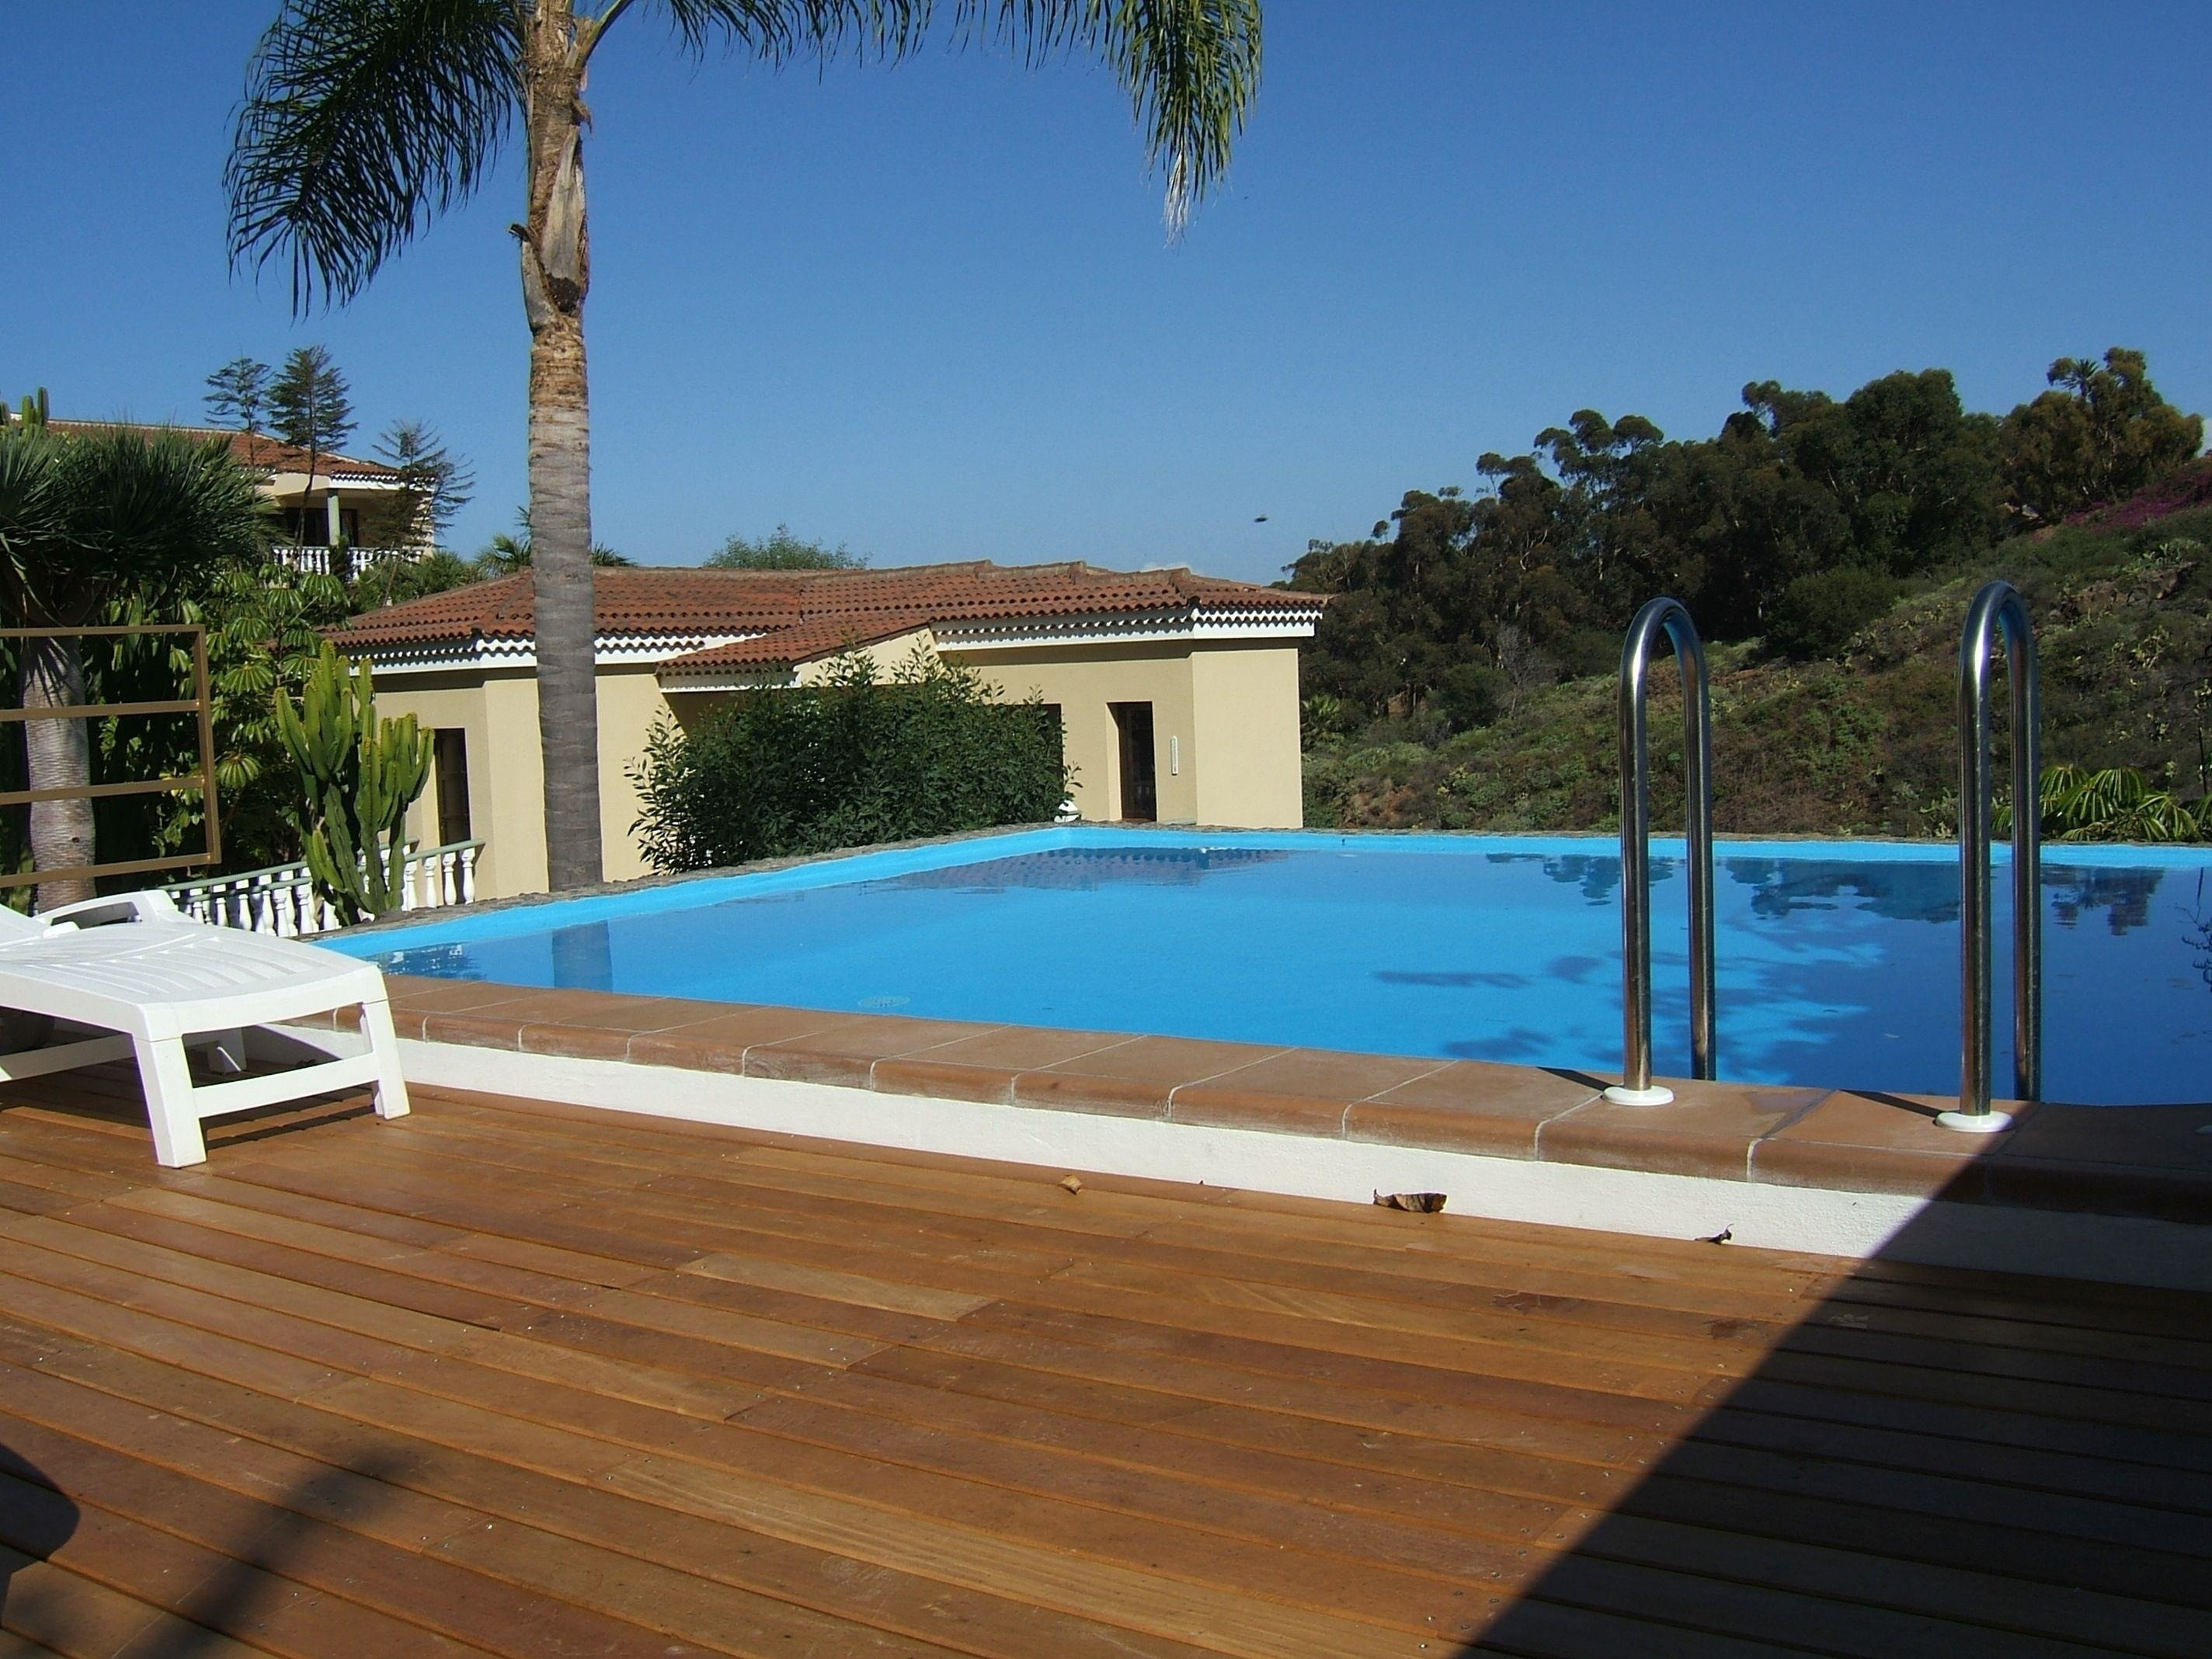 Appartement de vacances Fewo Atico Florasol, sehr ruhig direkt am Naturschutzgebiet, mit Pool, 2 Terrassen, Grill, (2492983), Santa Ursula, Ténérife, Iles Canaries, Espagne, image 18